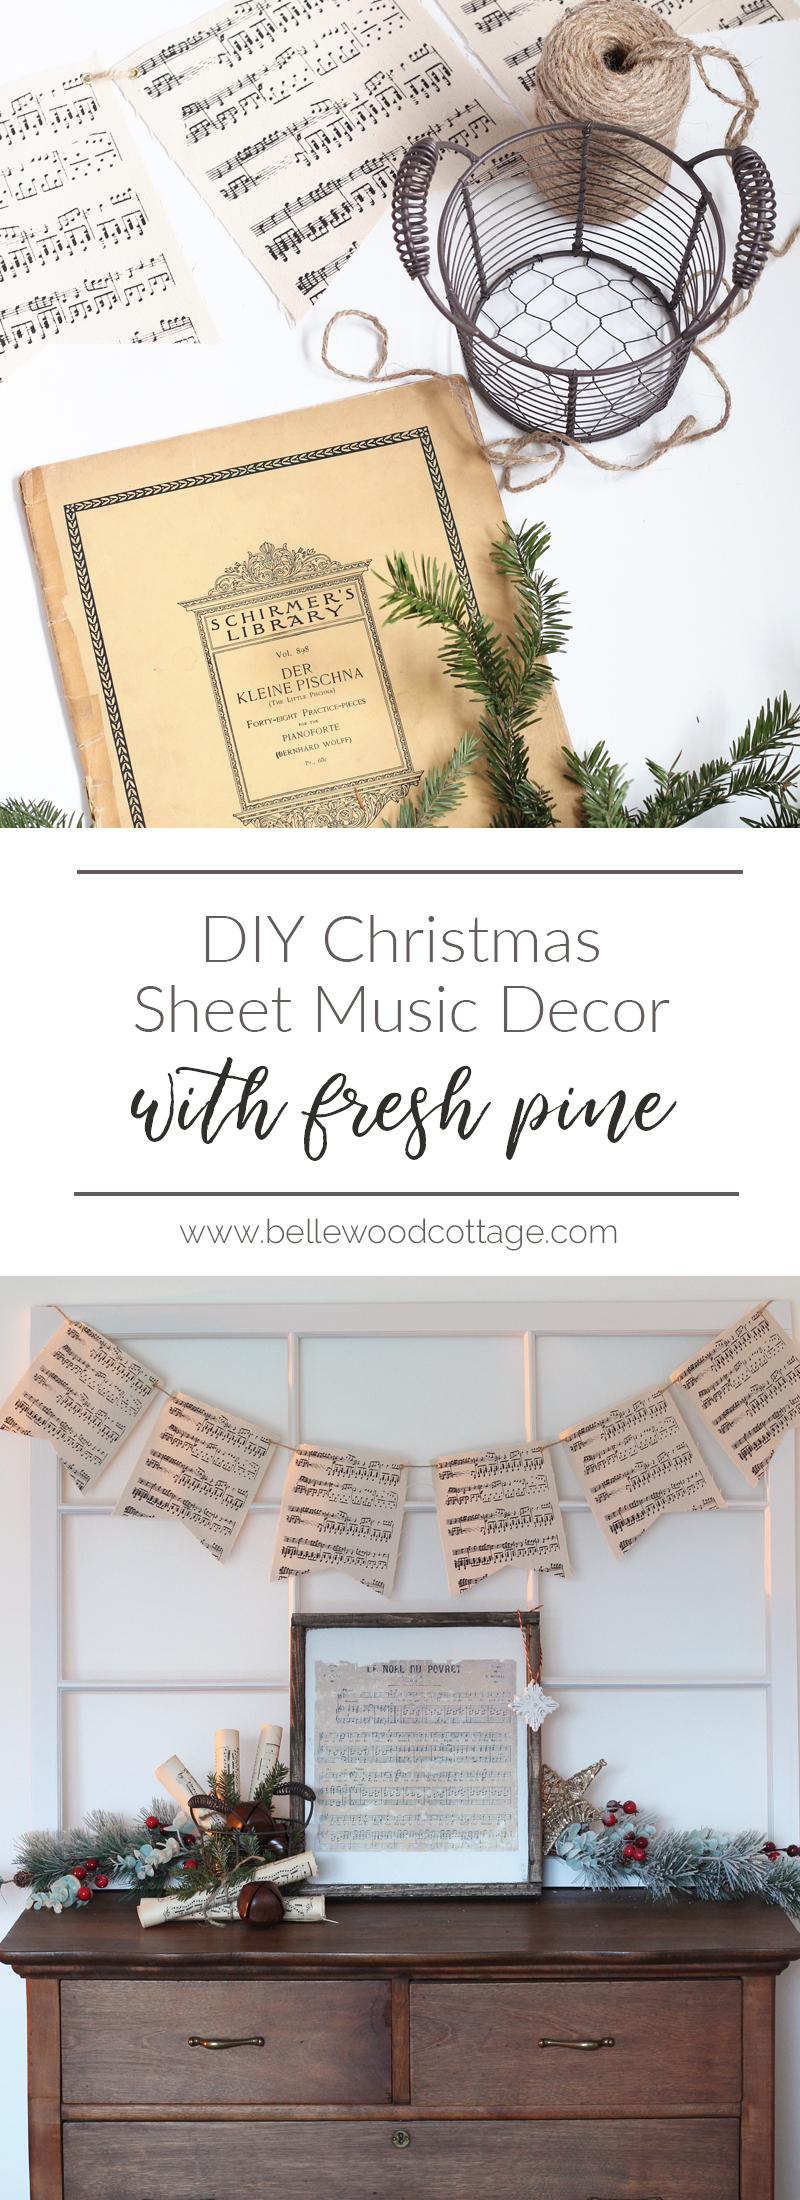 DIY Christmas Sheet Music Decor with Fresh Pine ...